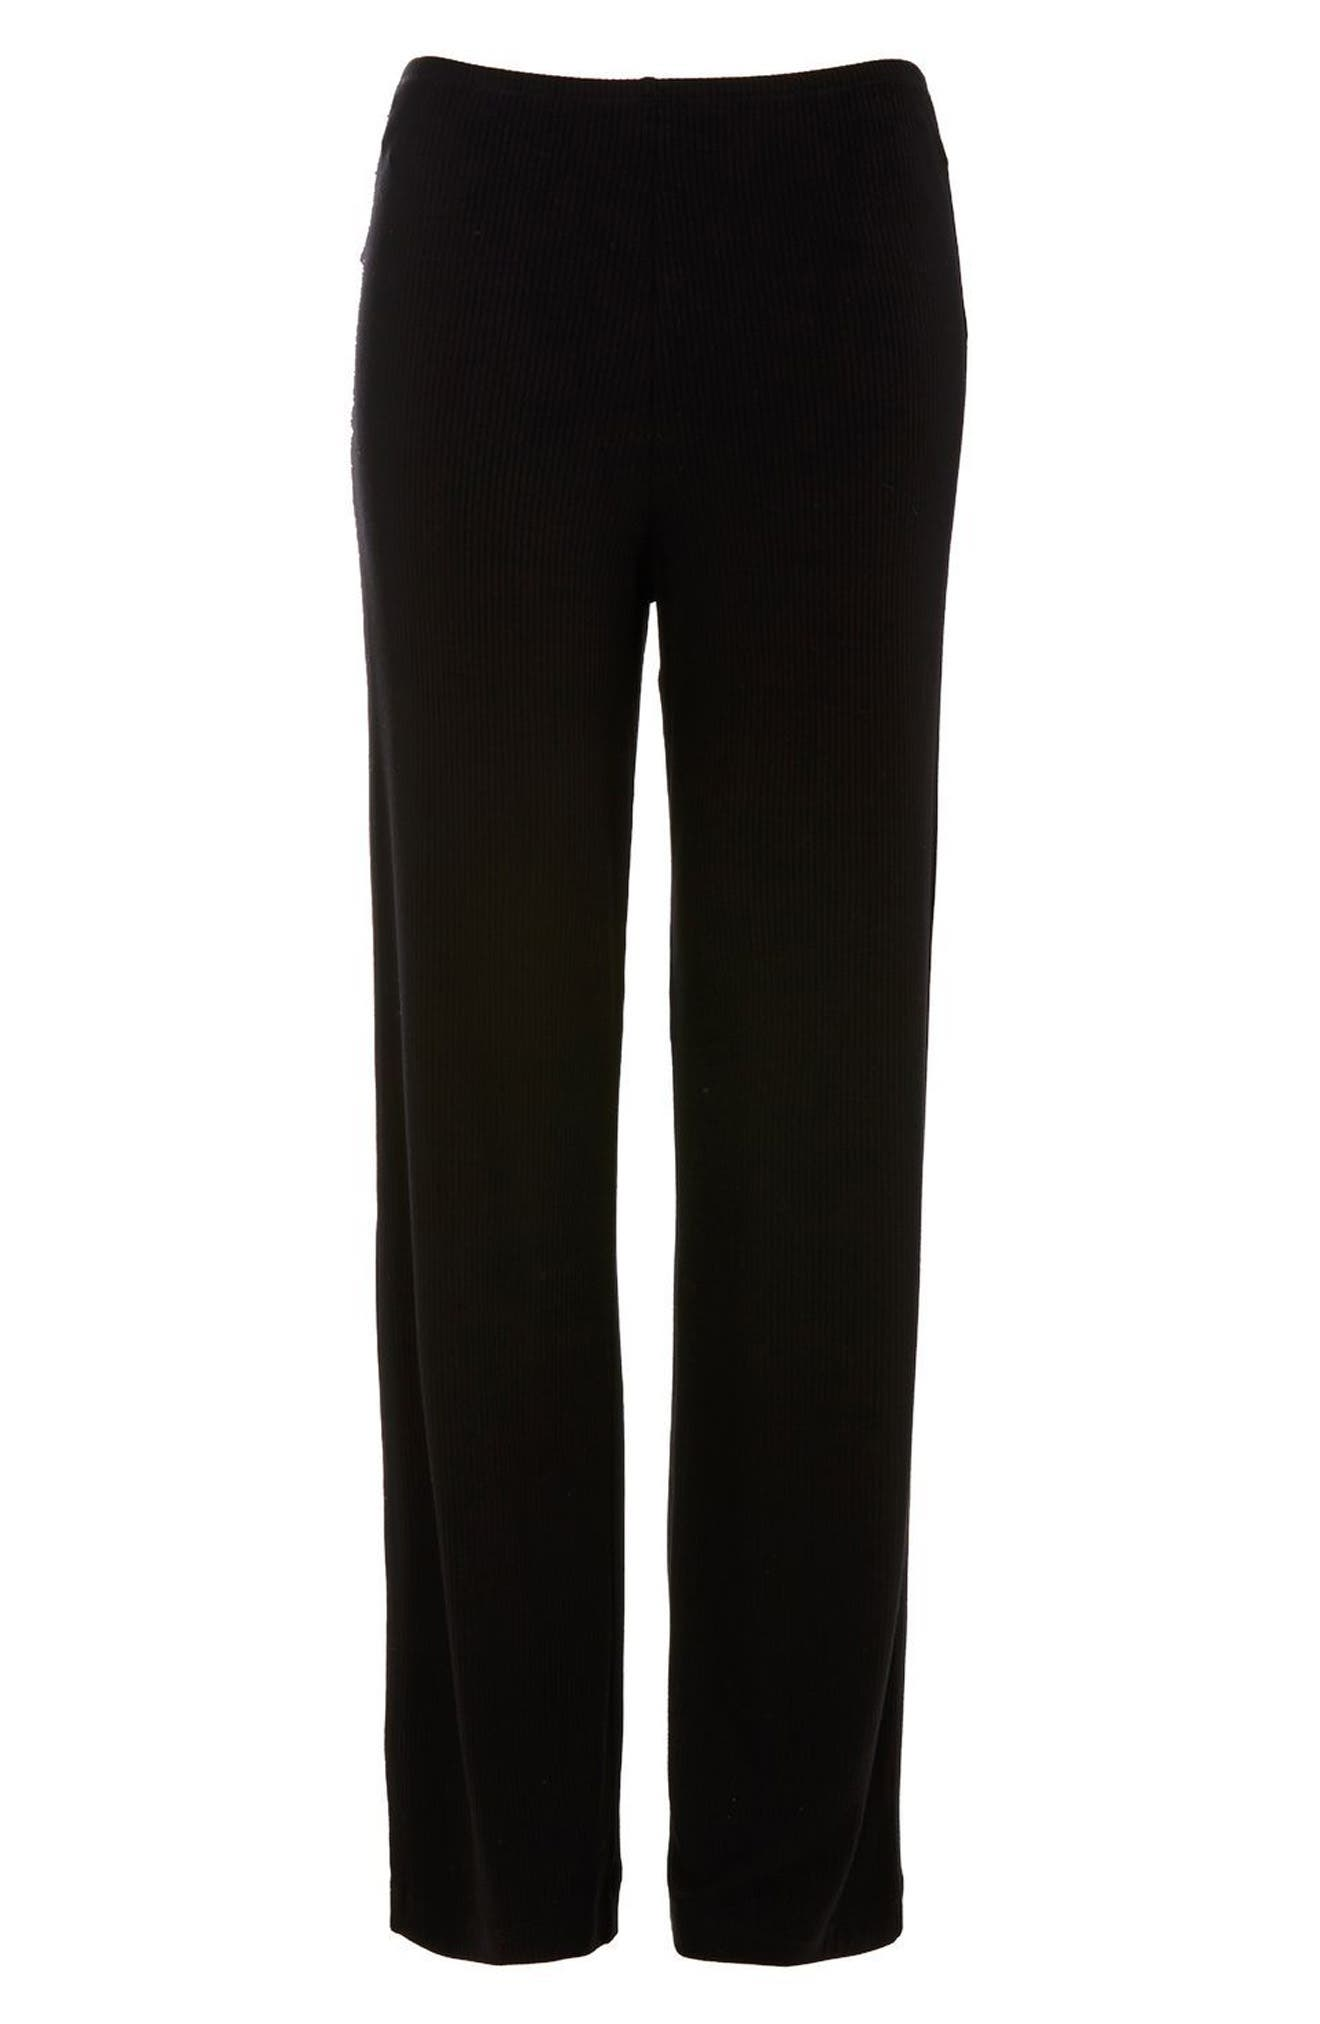 Ribbed Pajama Pants,                             Alternate thumbnail 3, color,                             Black